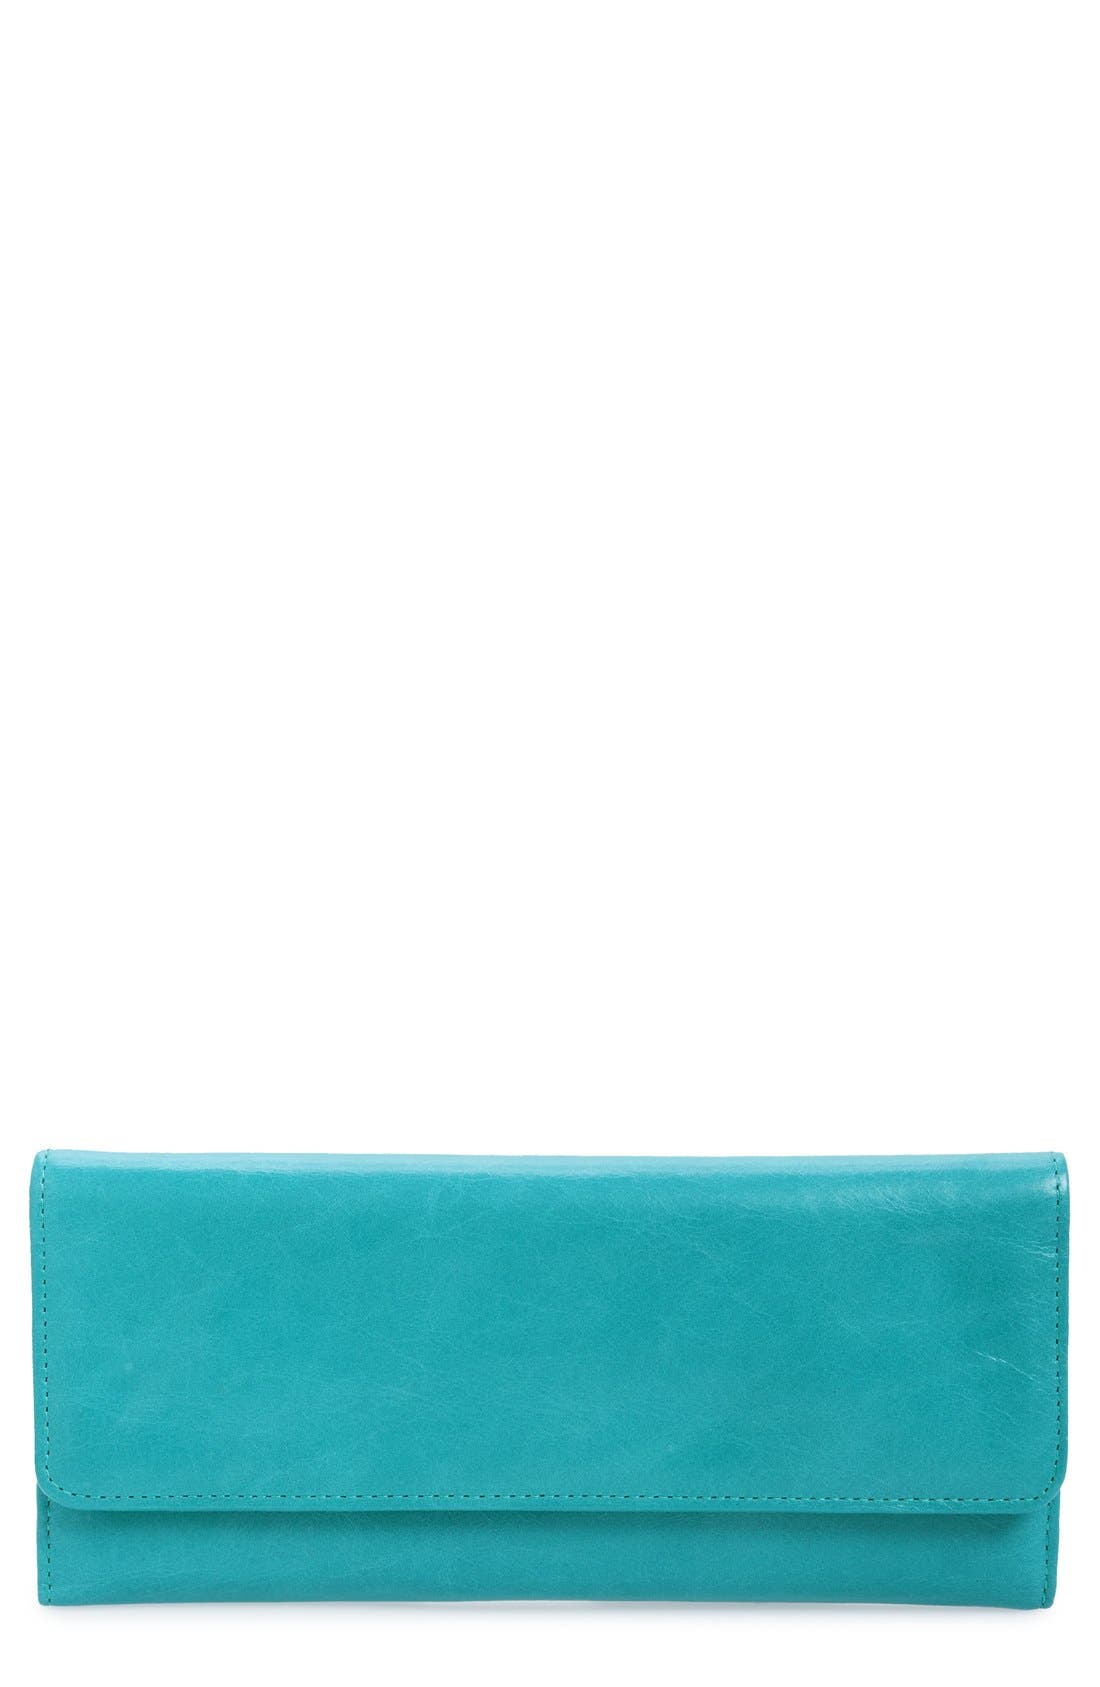 'Sadie' Leather Wallet,                             Main thumbnail 39, color,